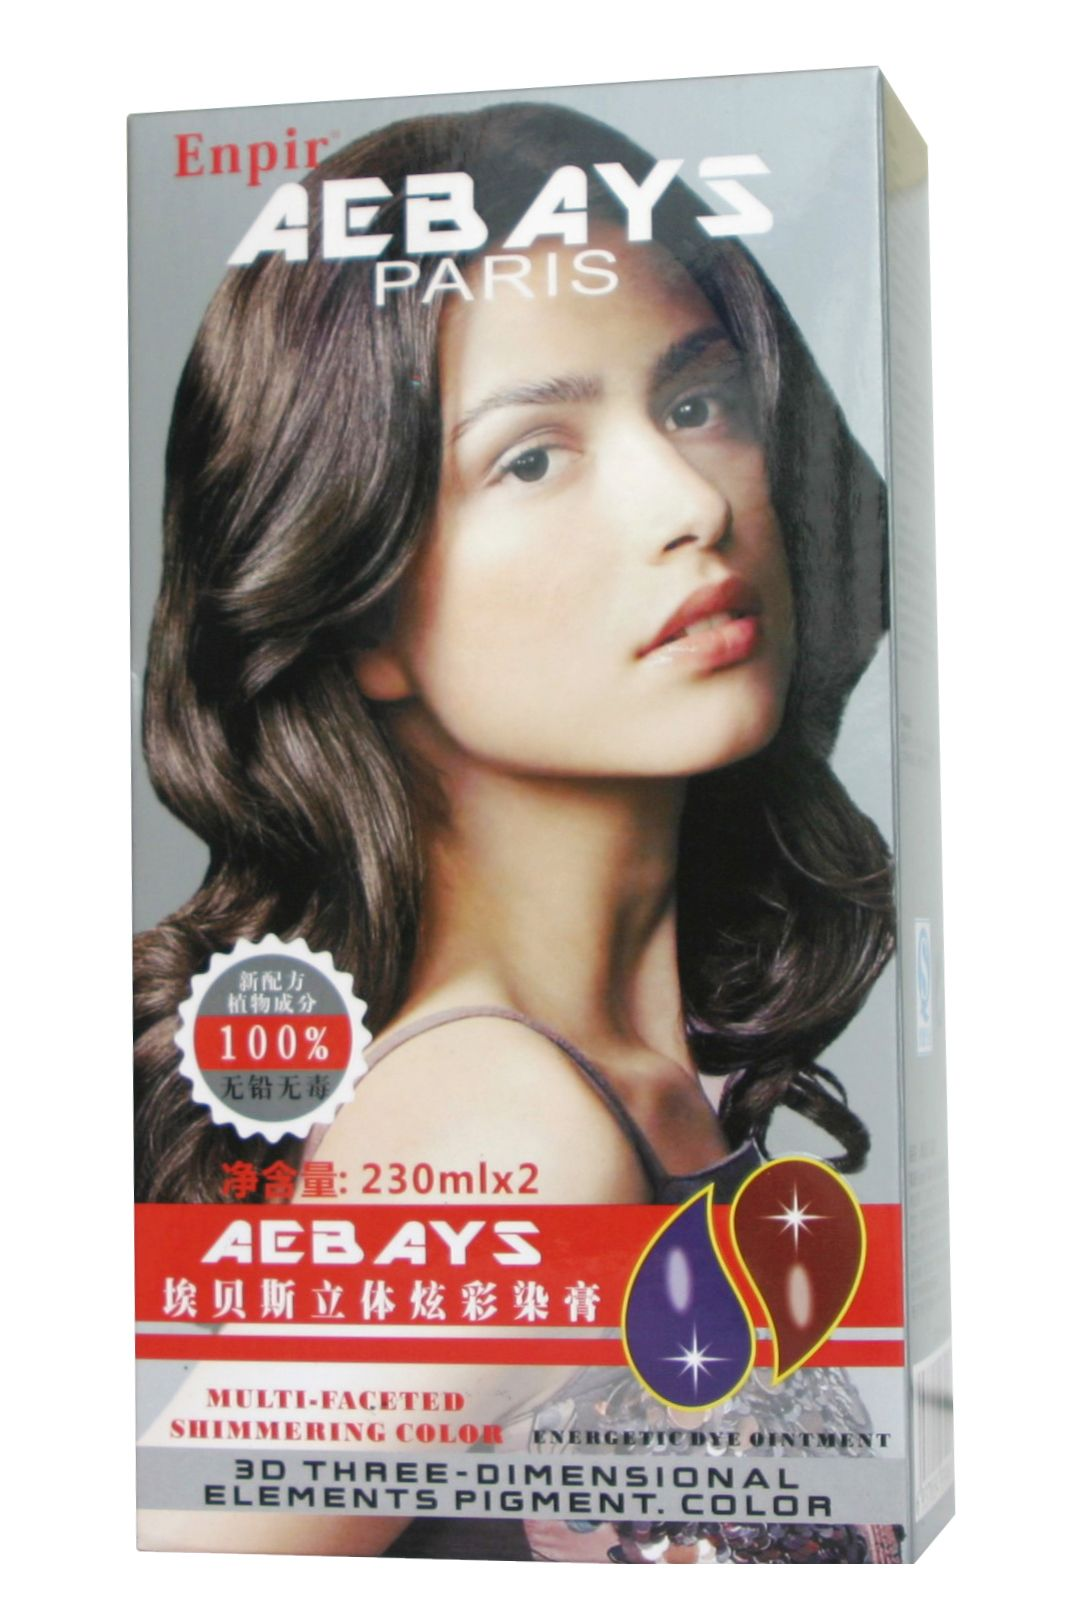 Hair Dye Color Dyed Hair Hair Dye Colors Cosmetic Companies